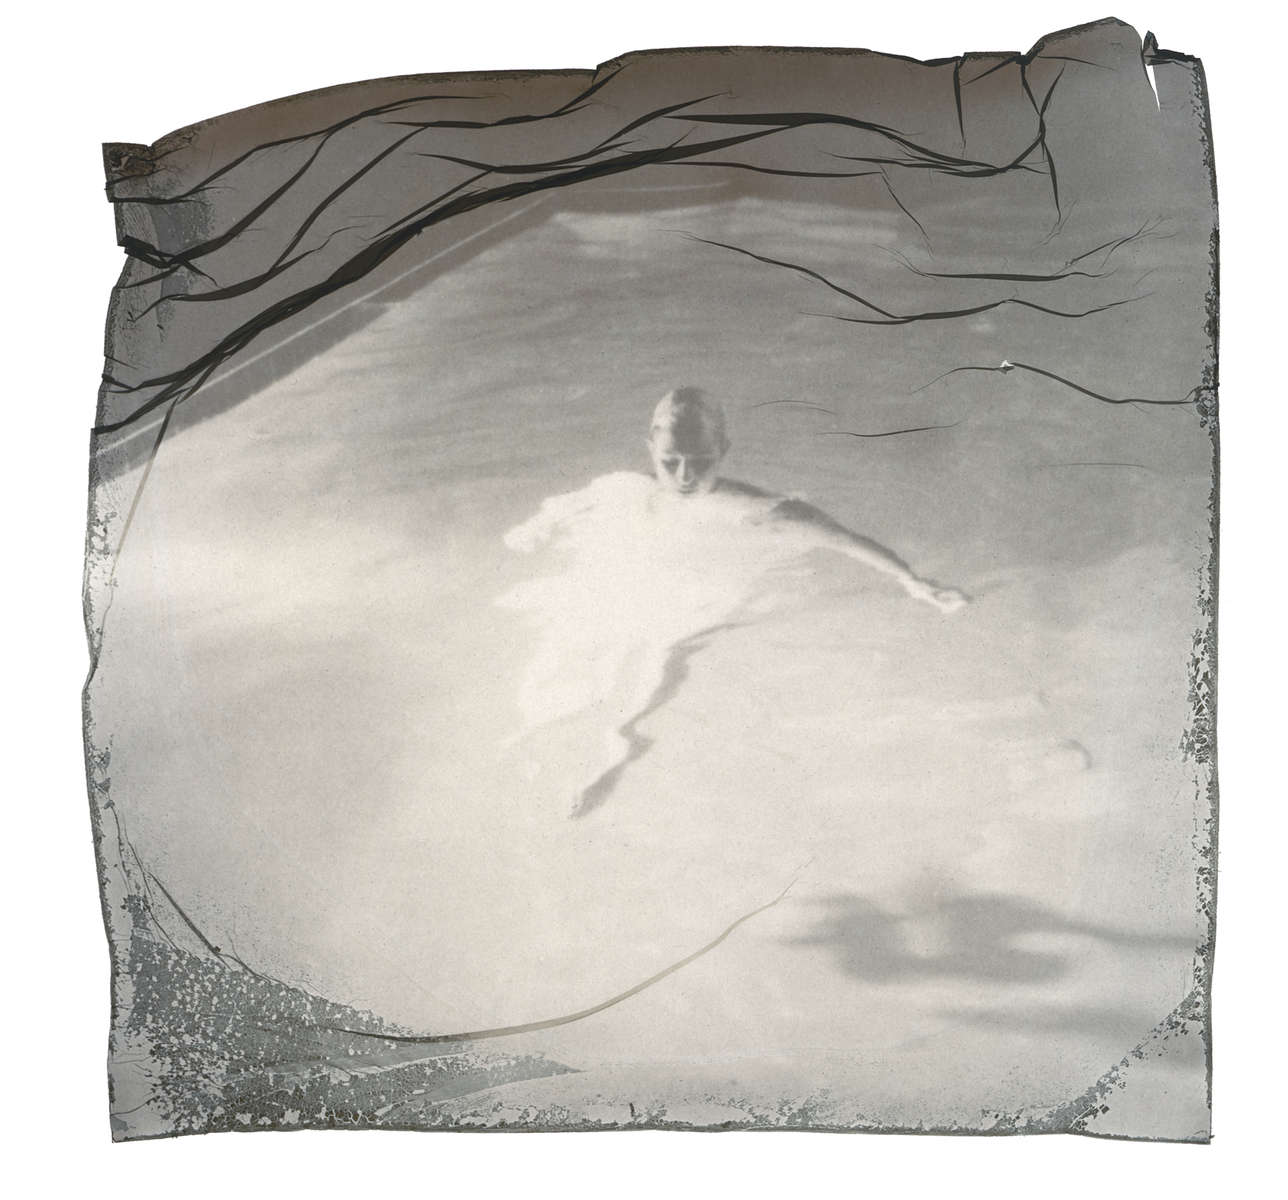 SX-70 Black and White filmEmulsion Lift onto Yupo Semi-Transparent Watercolor Paper